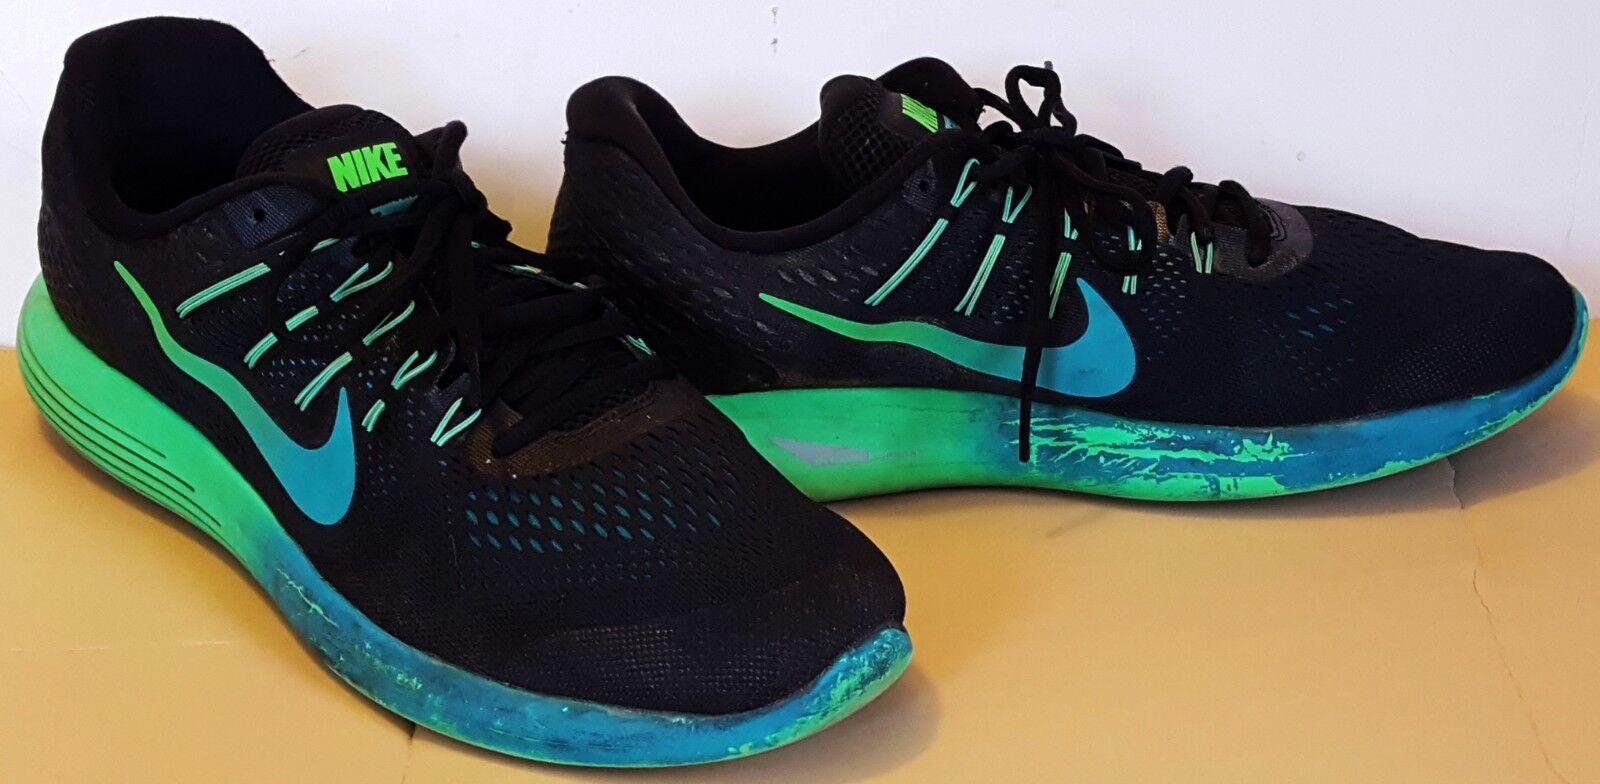 NIKE homme LUNARGLIDE 8 noir jade teal mesh RUNNING Chaussures 843725-003 Taille 14